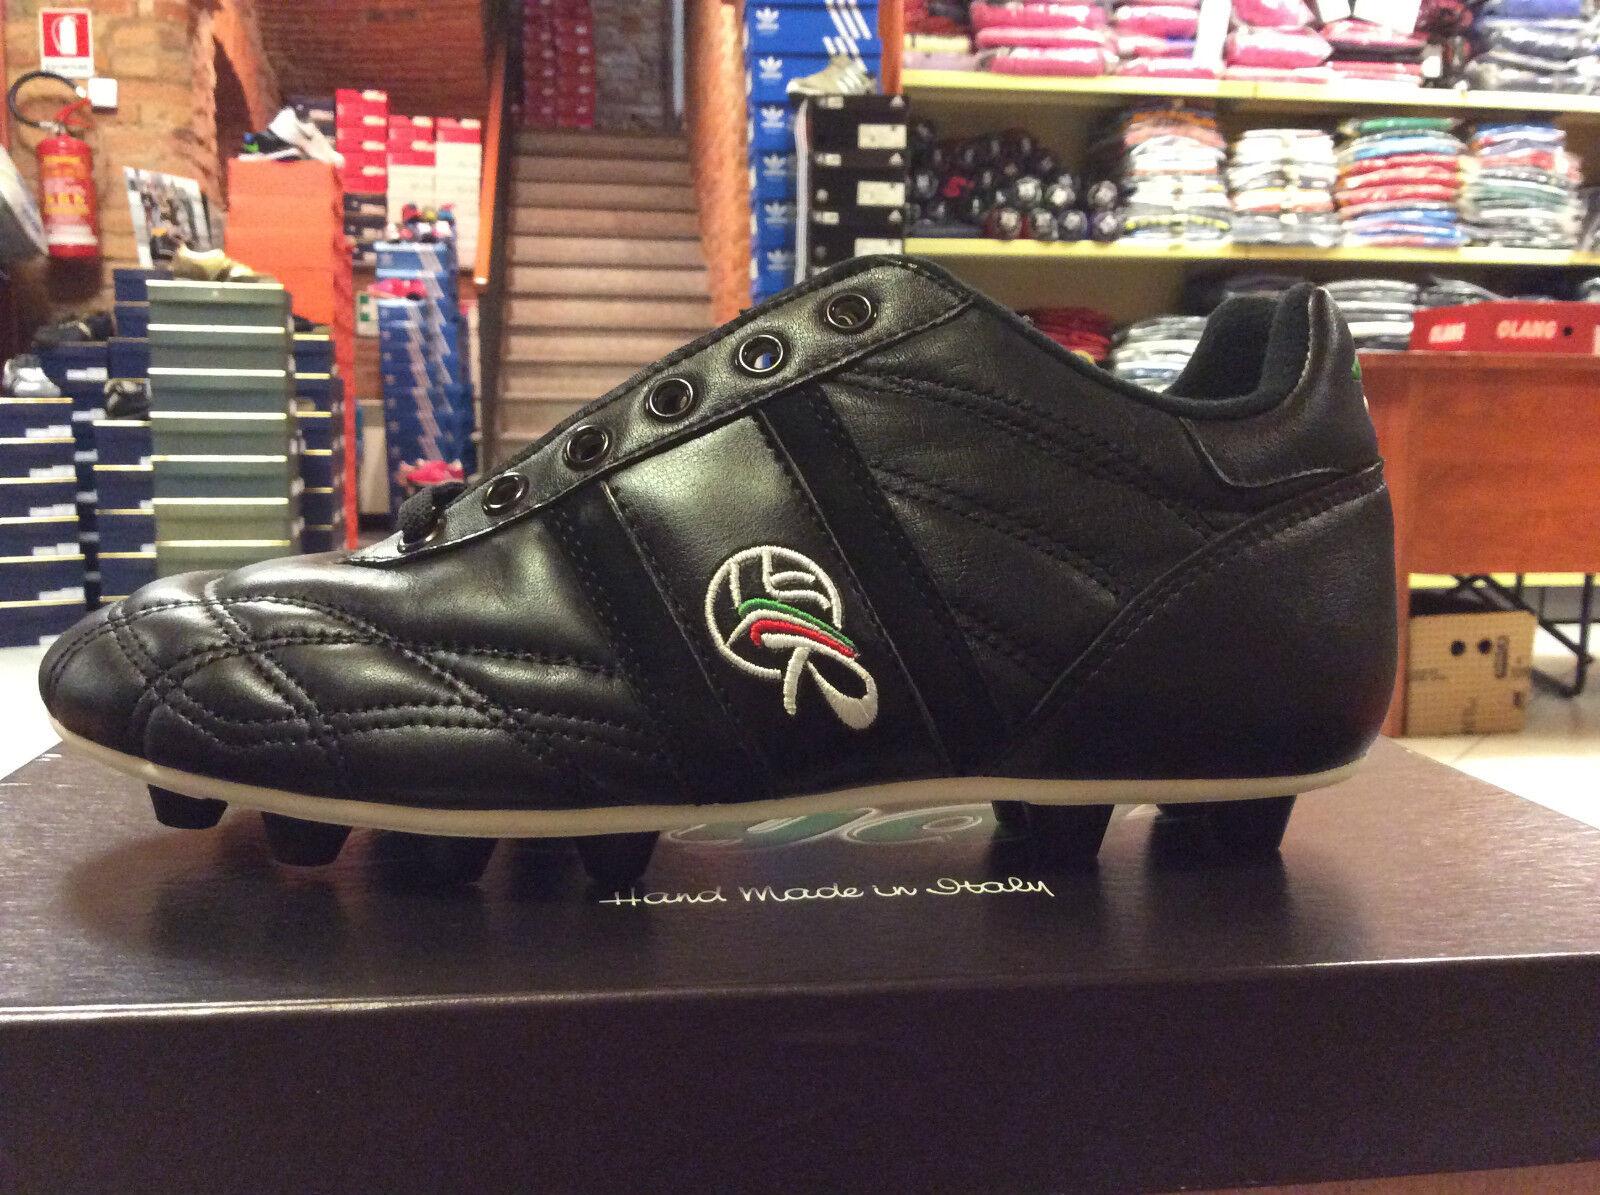 Herren Schuhe Fußball RYAL klassisch - 13 Stollen Leder volle Fiore